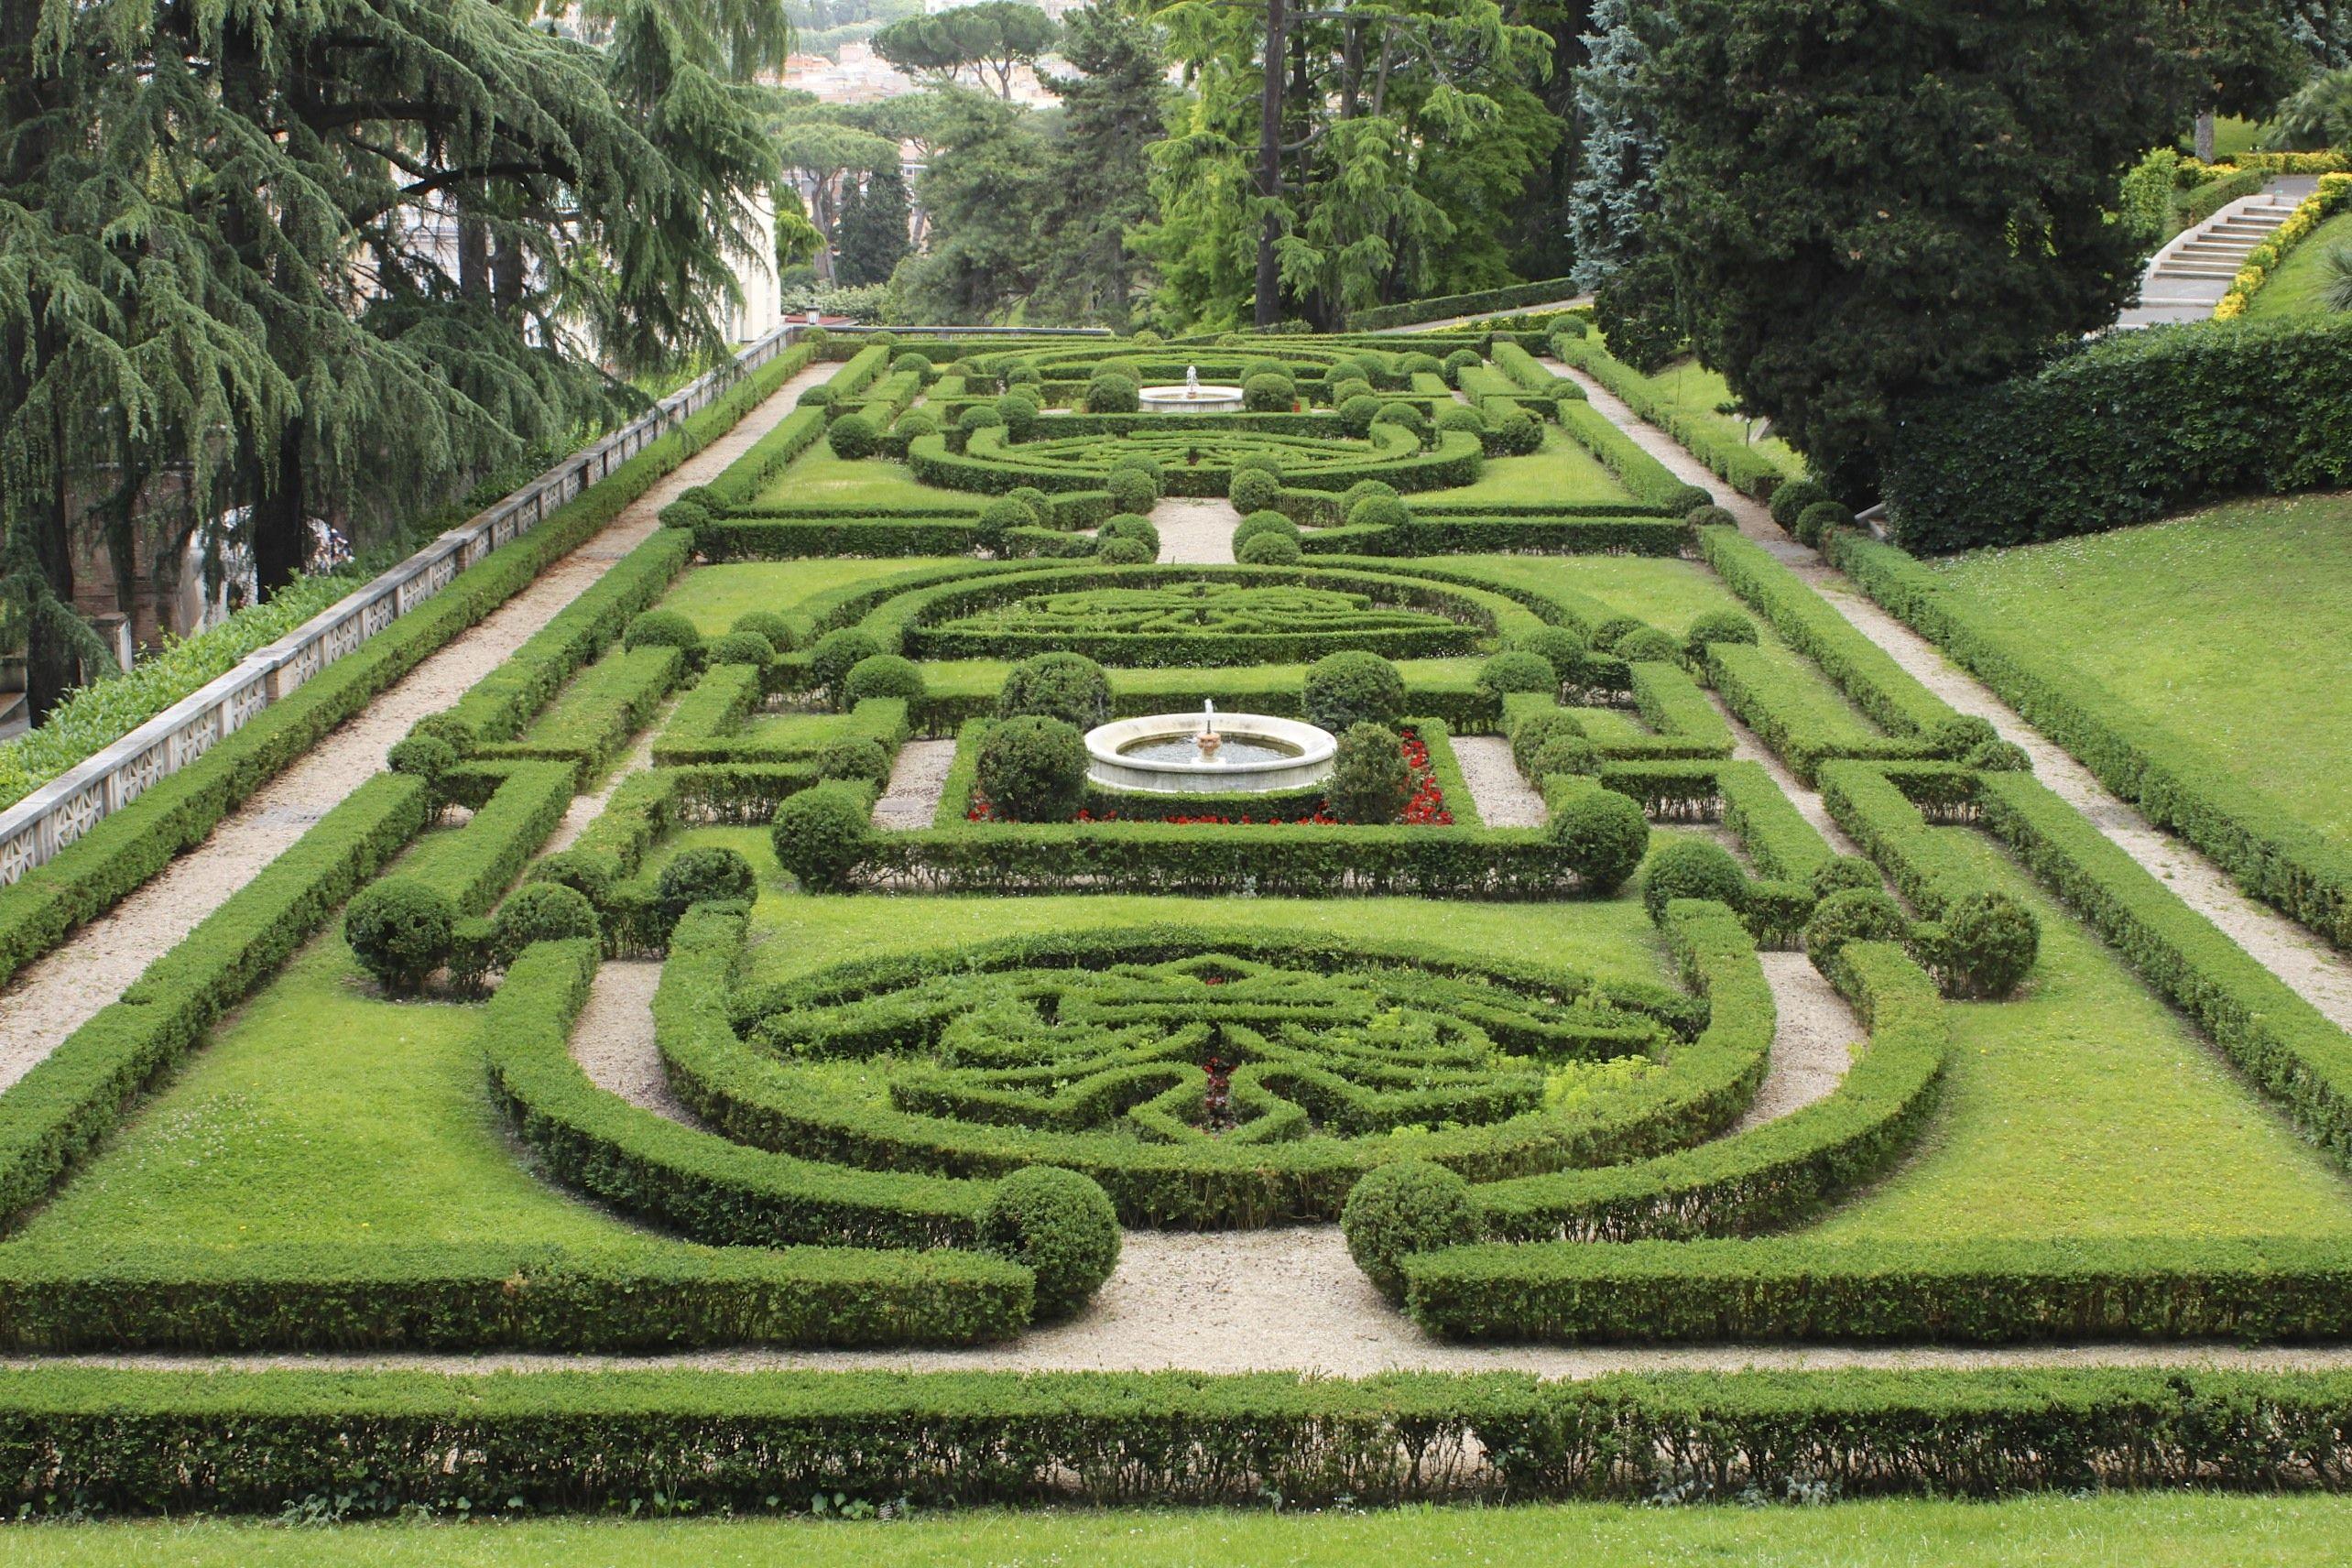 3d951fa40c17670d276993839d97a64b - Vatican Gardens And Vatican Museums Tour